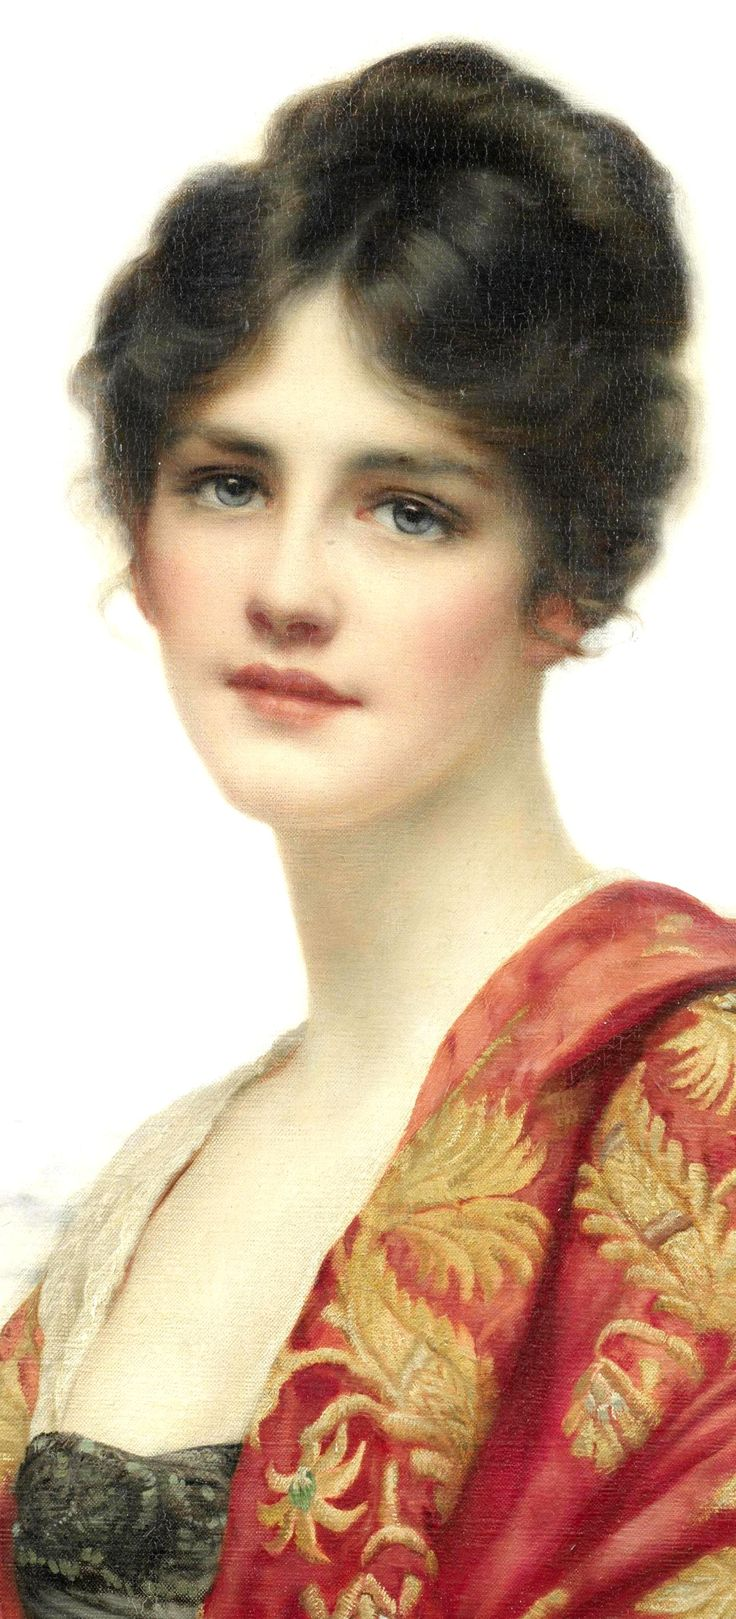 Esme - detail - 1919 - Painting by William Clarke Wontner (British, 1857-1930)